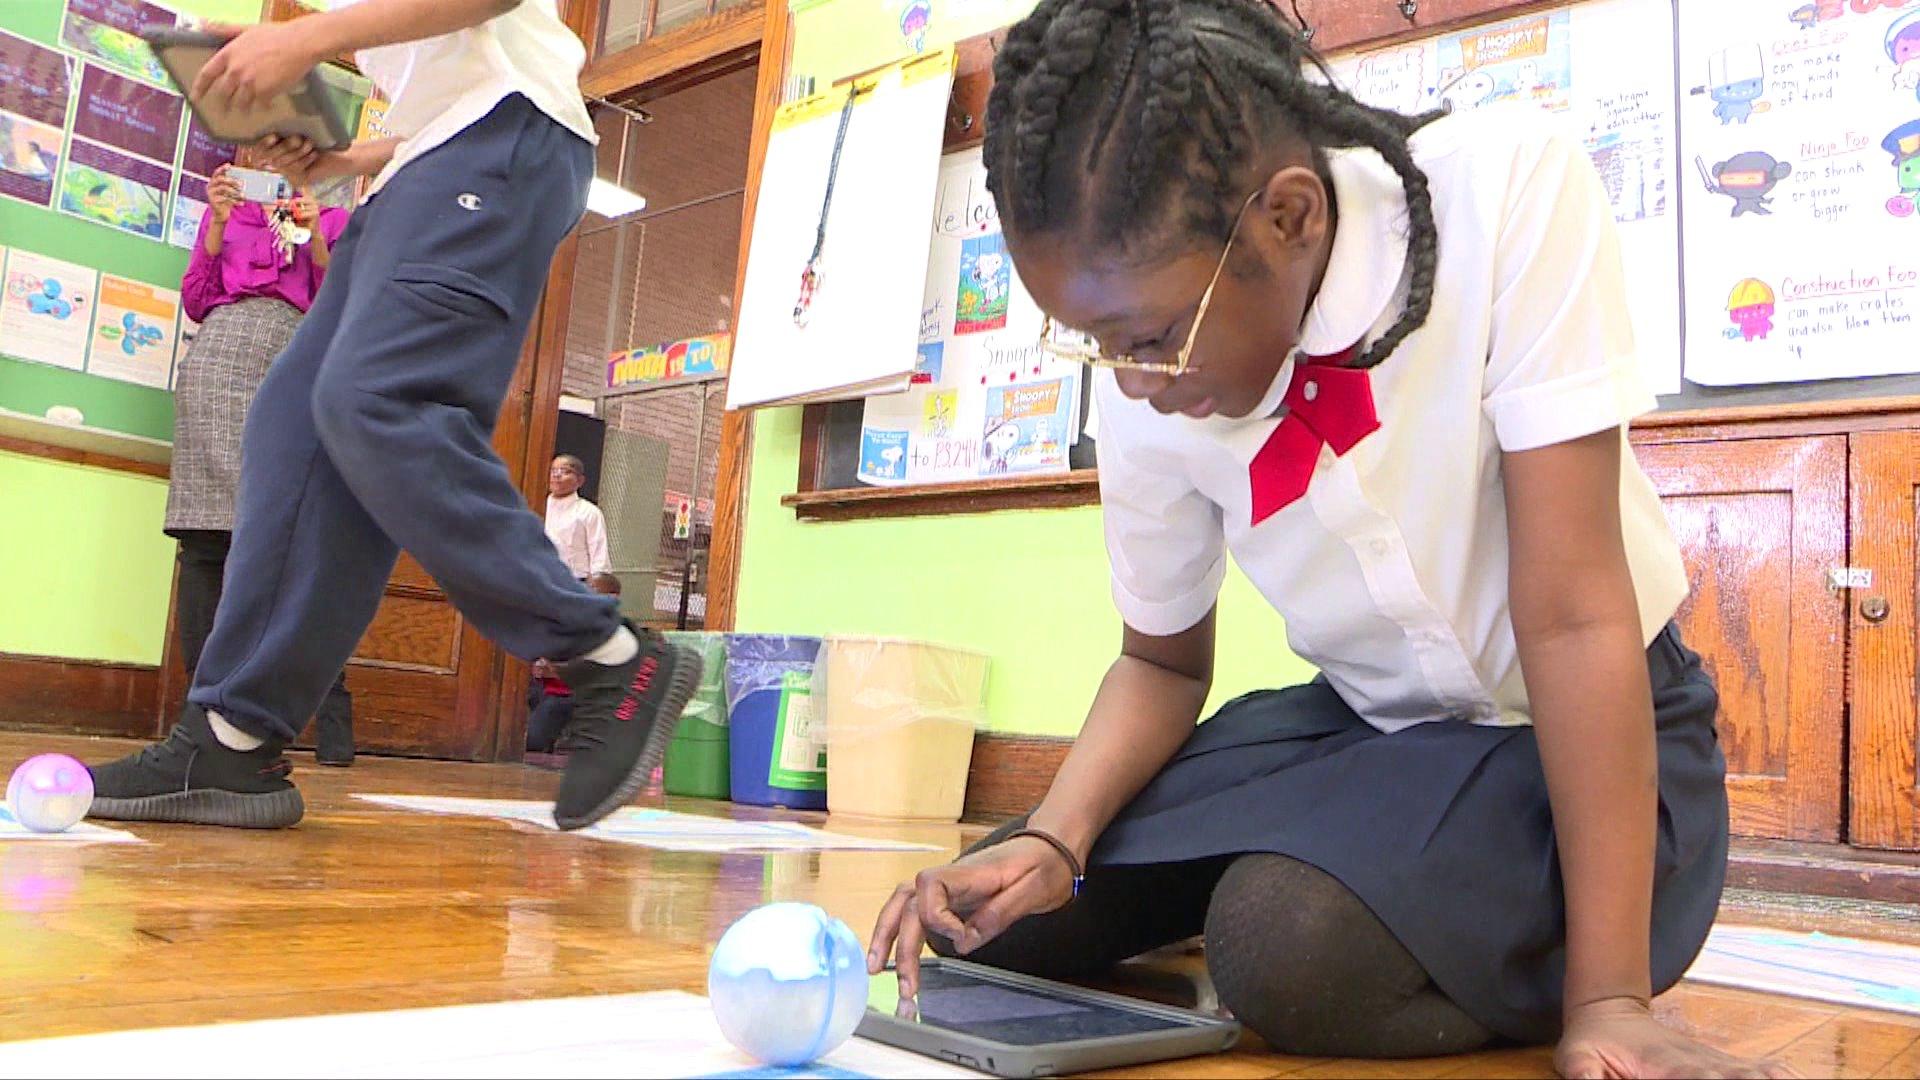 Students learn robotics, programming skills at Brooklynschool